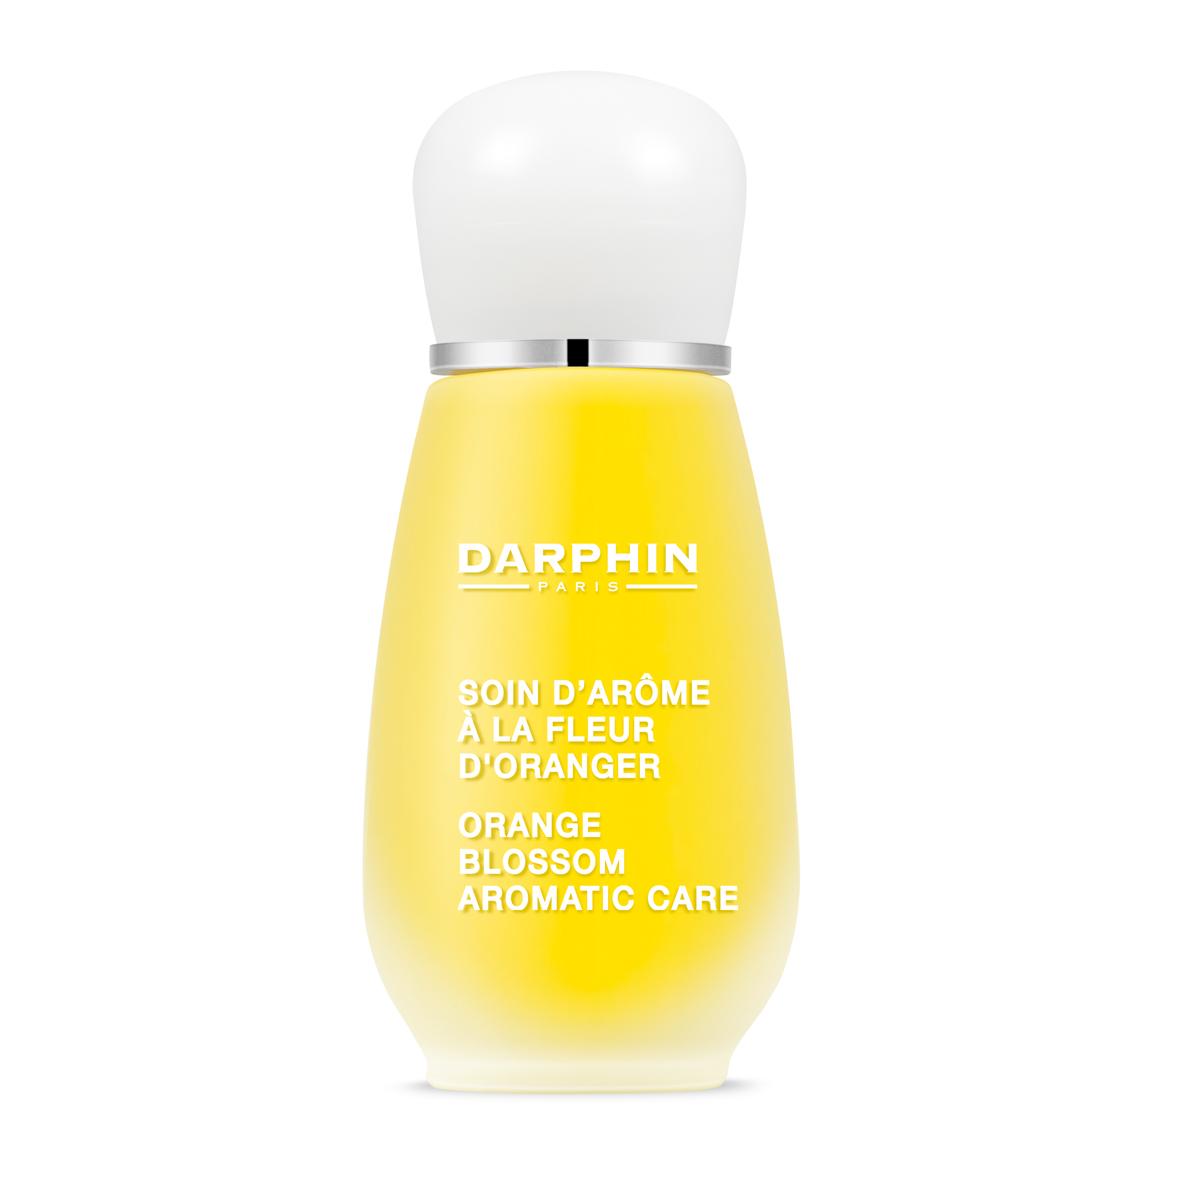 Orange Blossom Aromatic Care